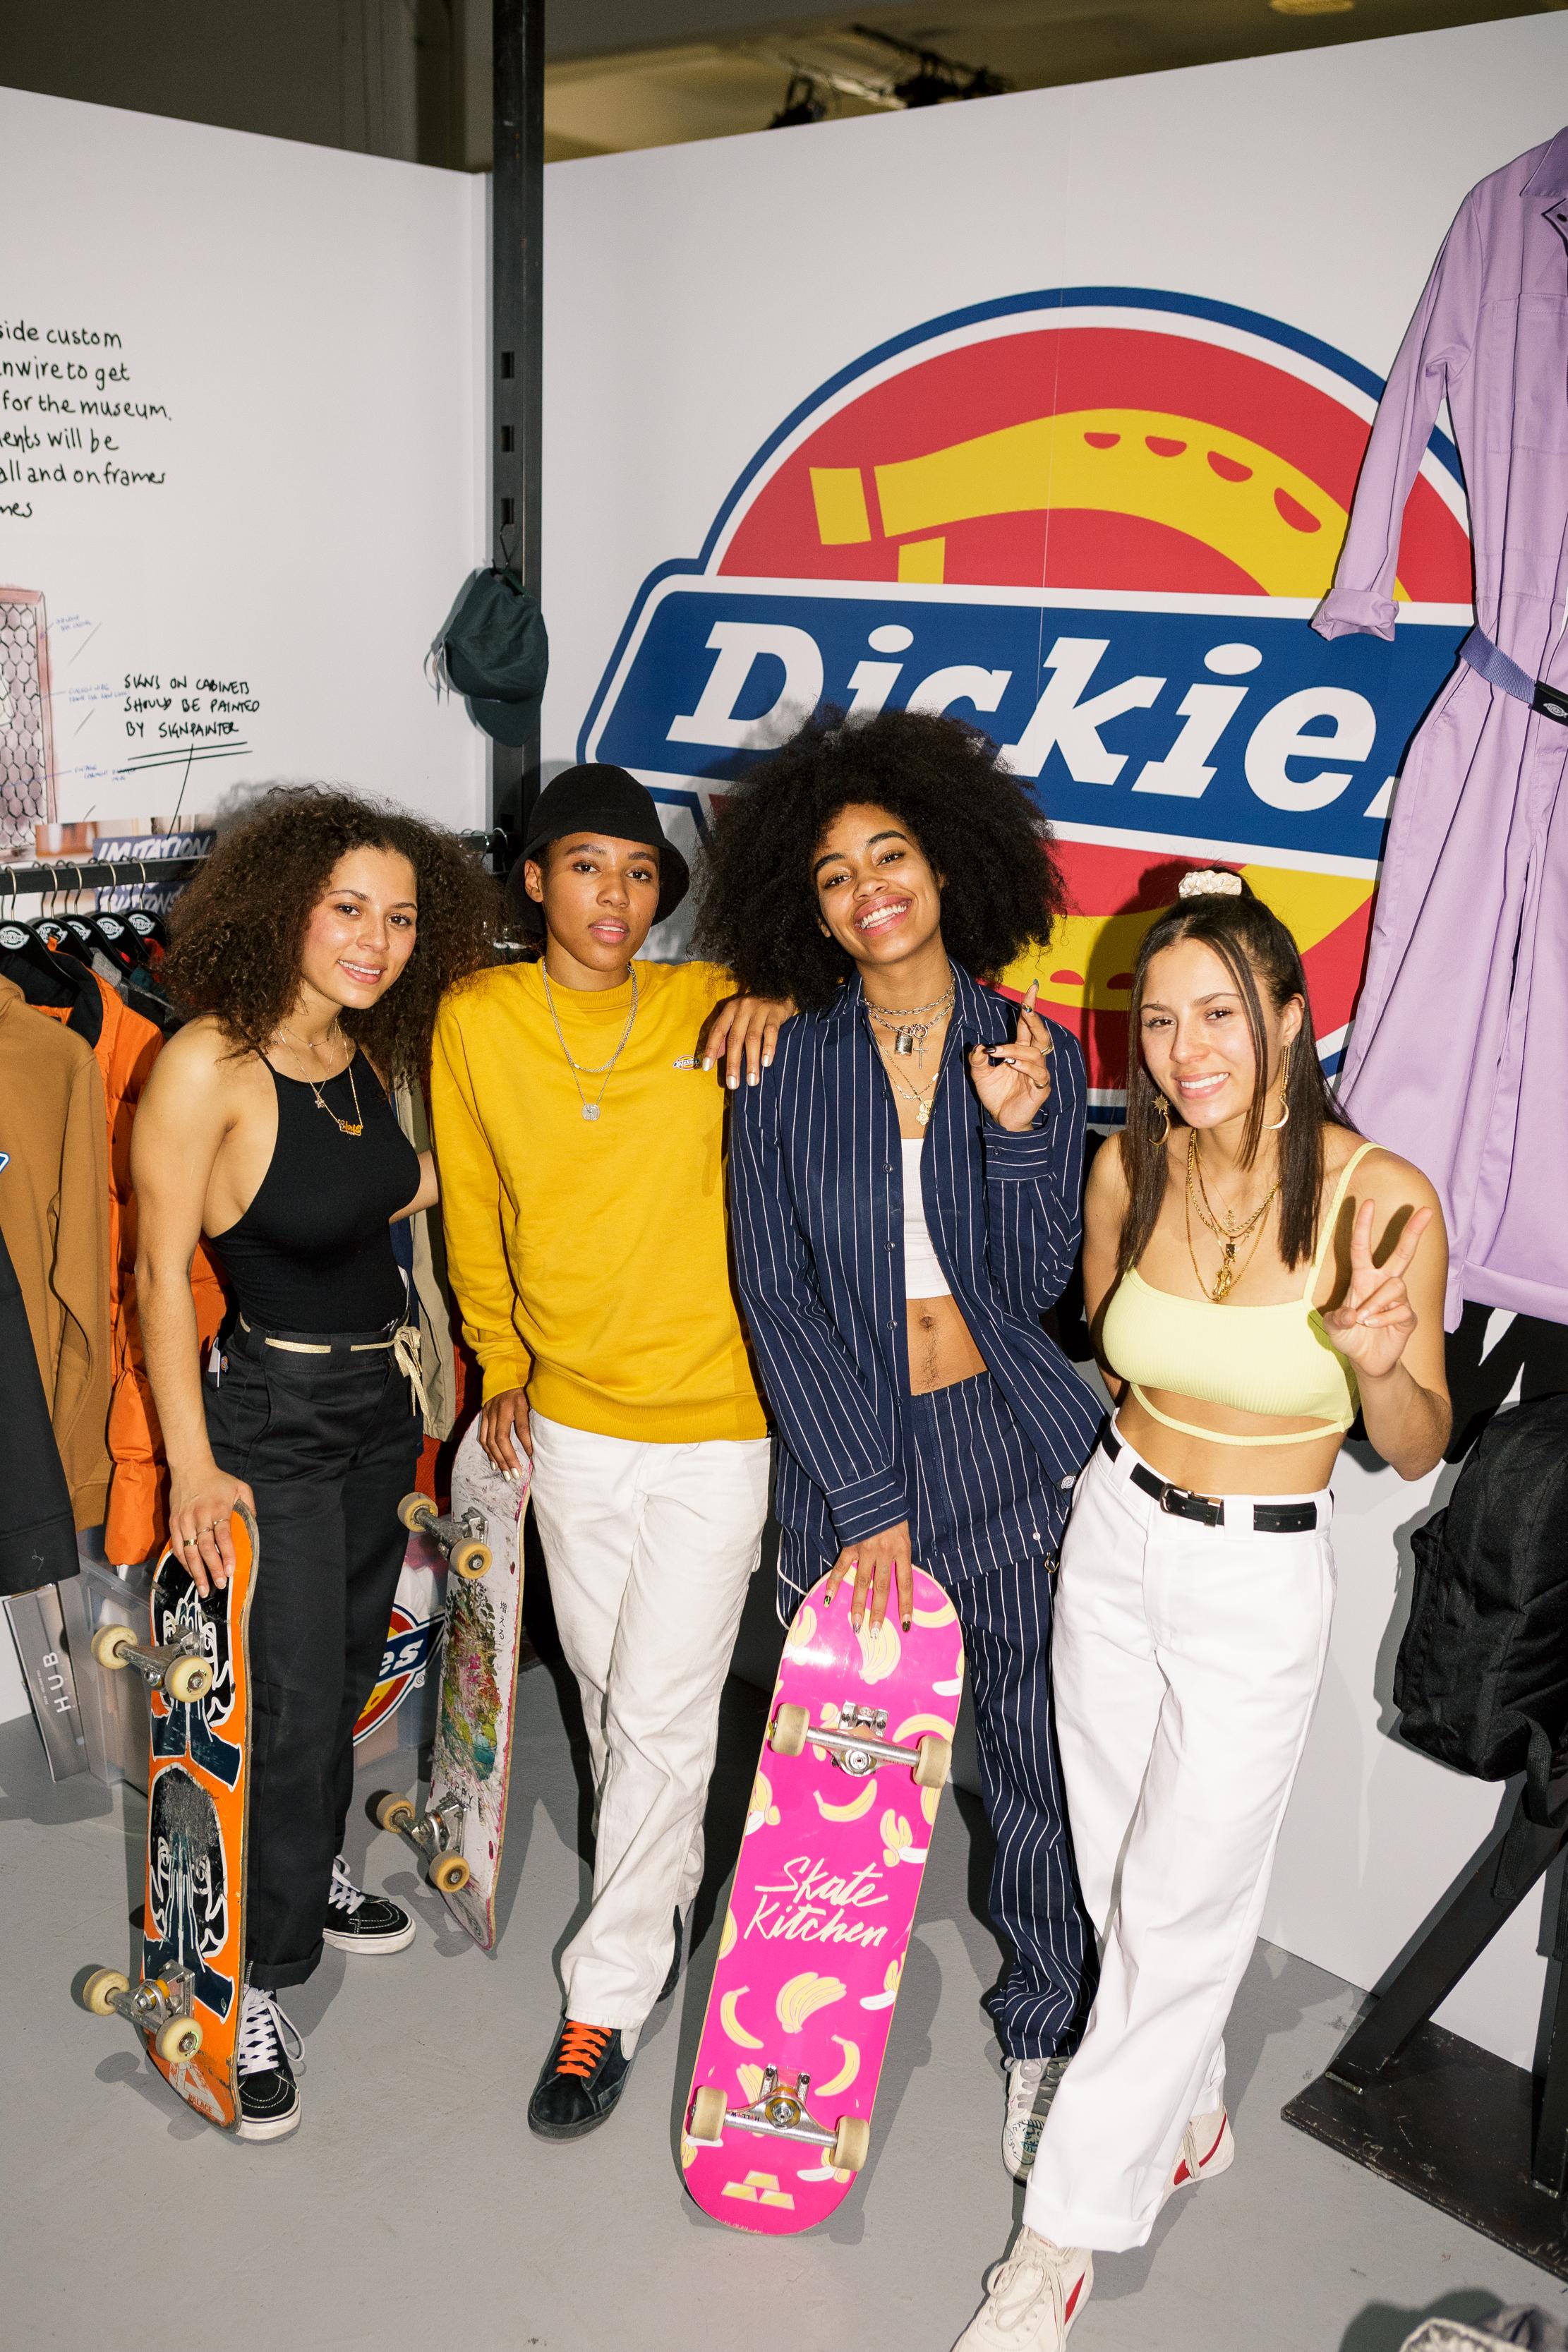 Skate Kitchen - Dickies